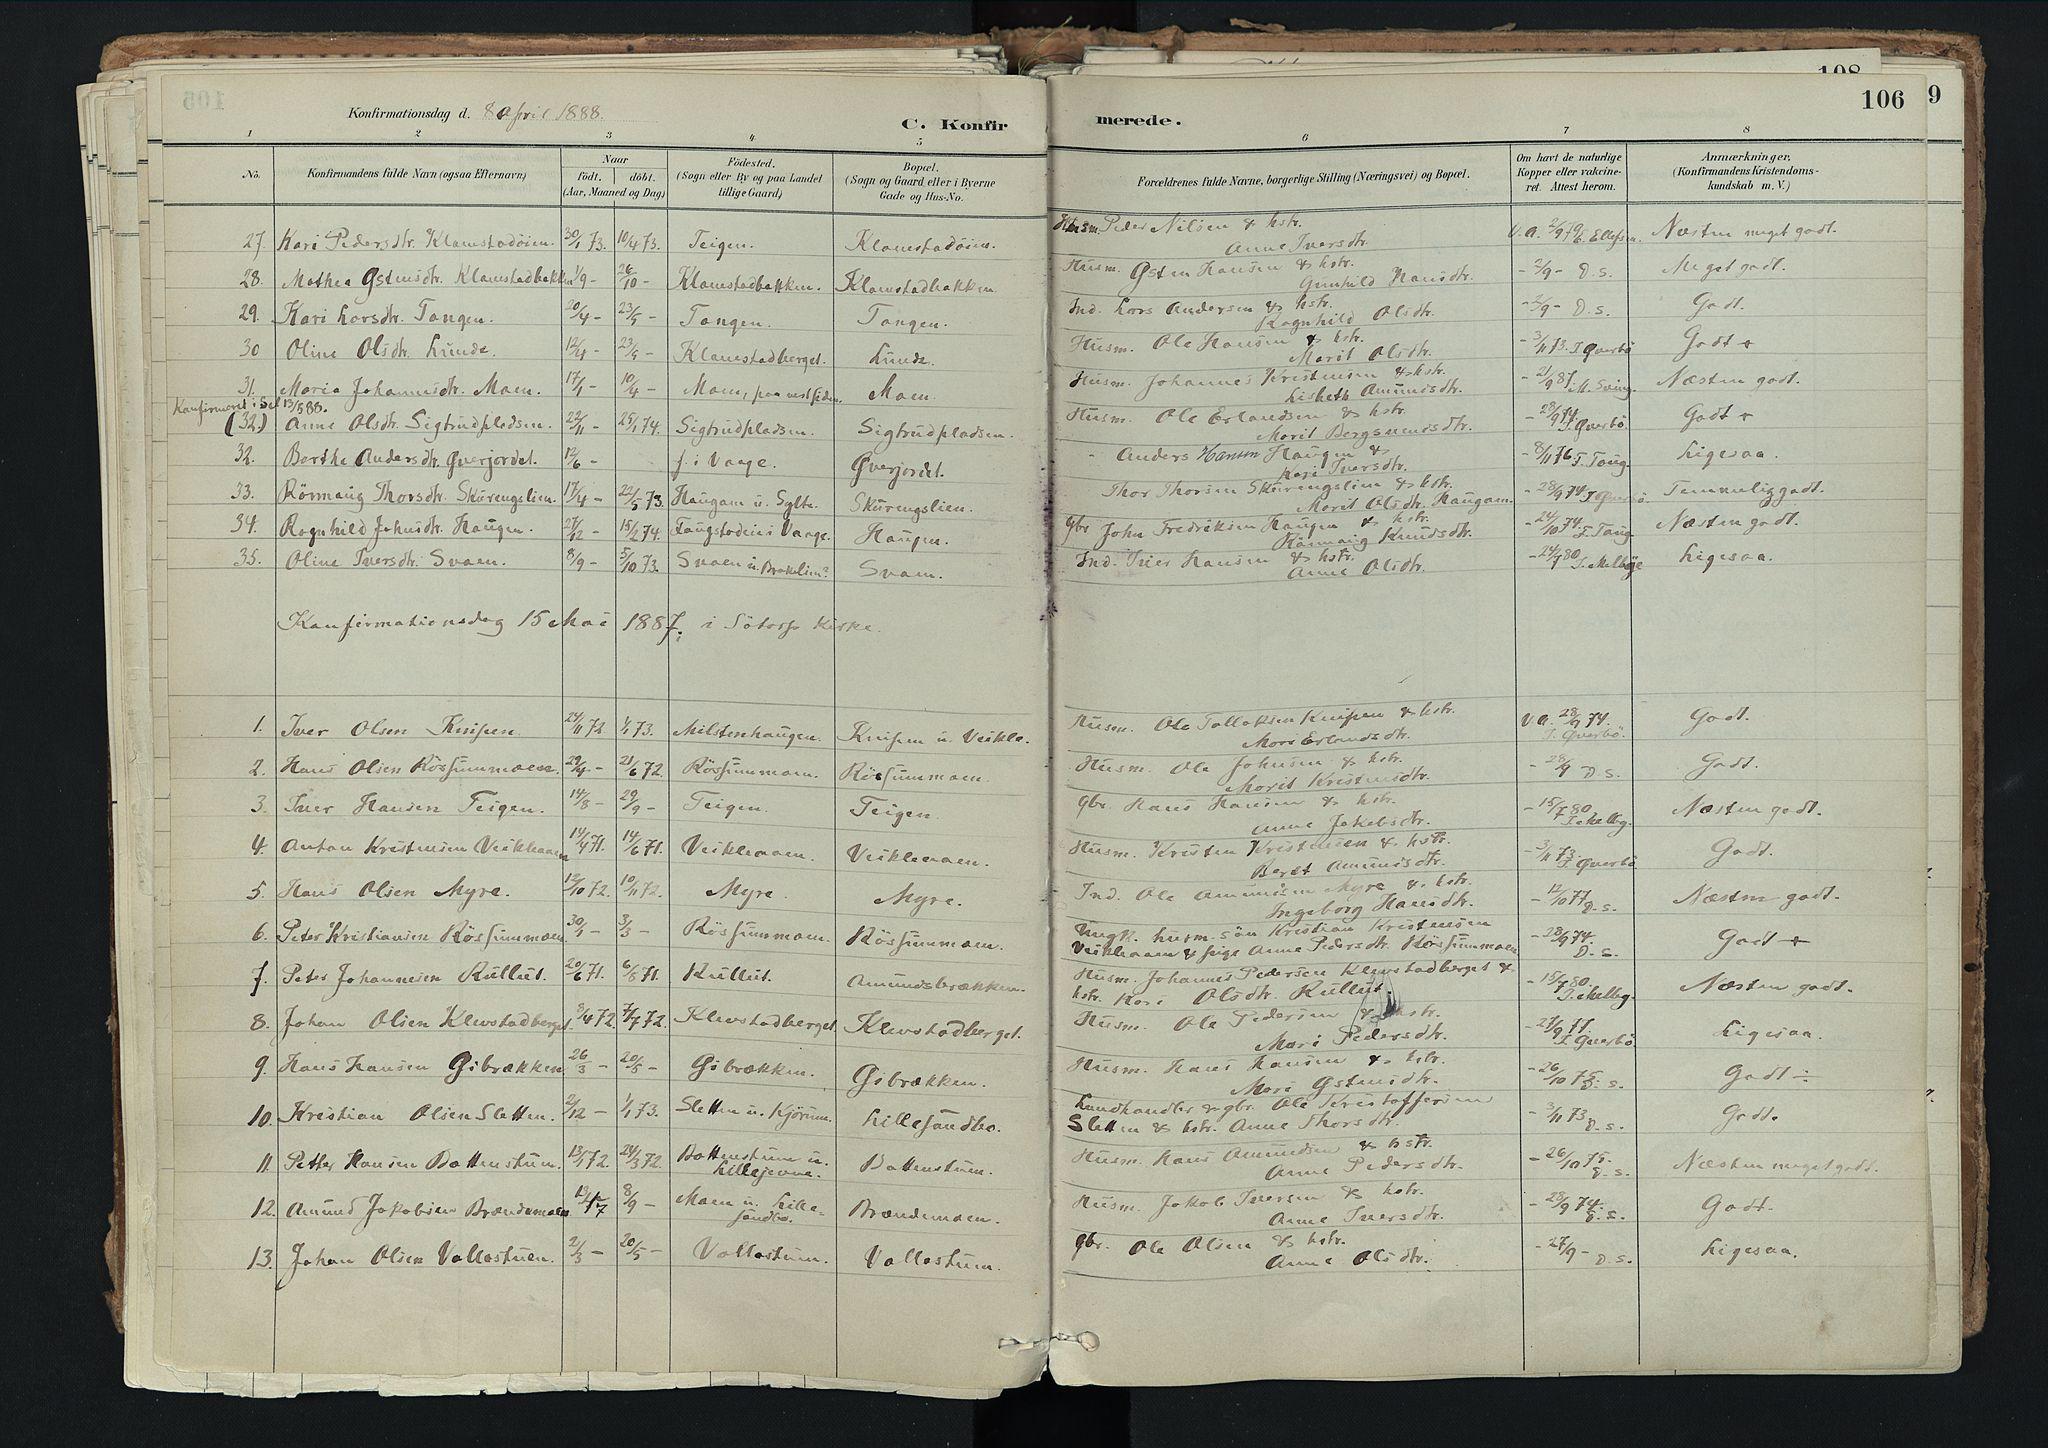 SAH, Nord-Fron prestekontor, Ministerialbok nr. 3, 1884-1914, s. 106